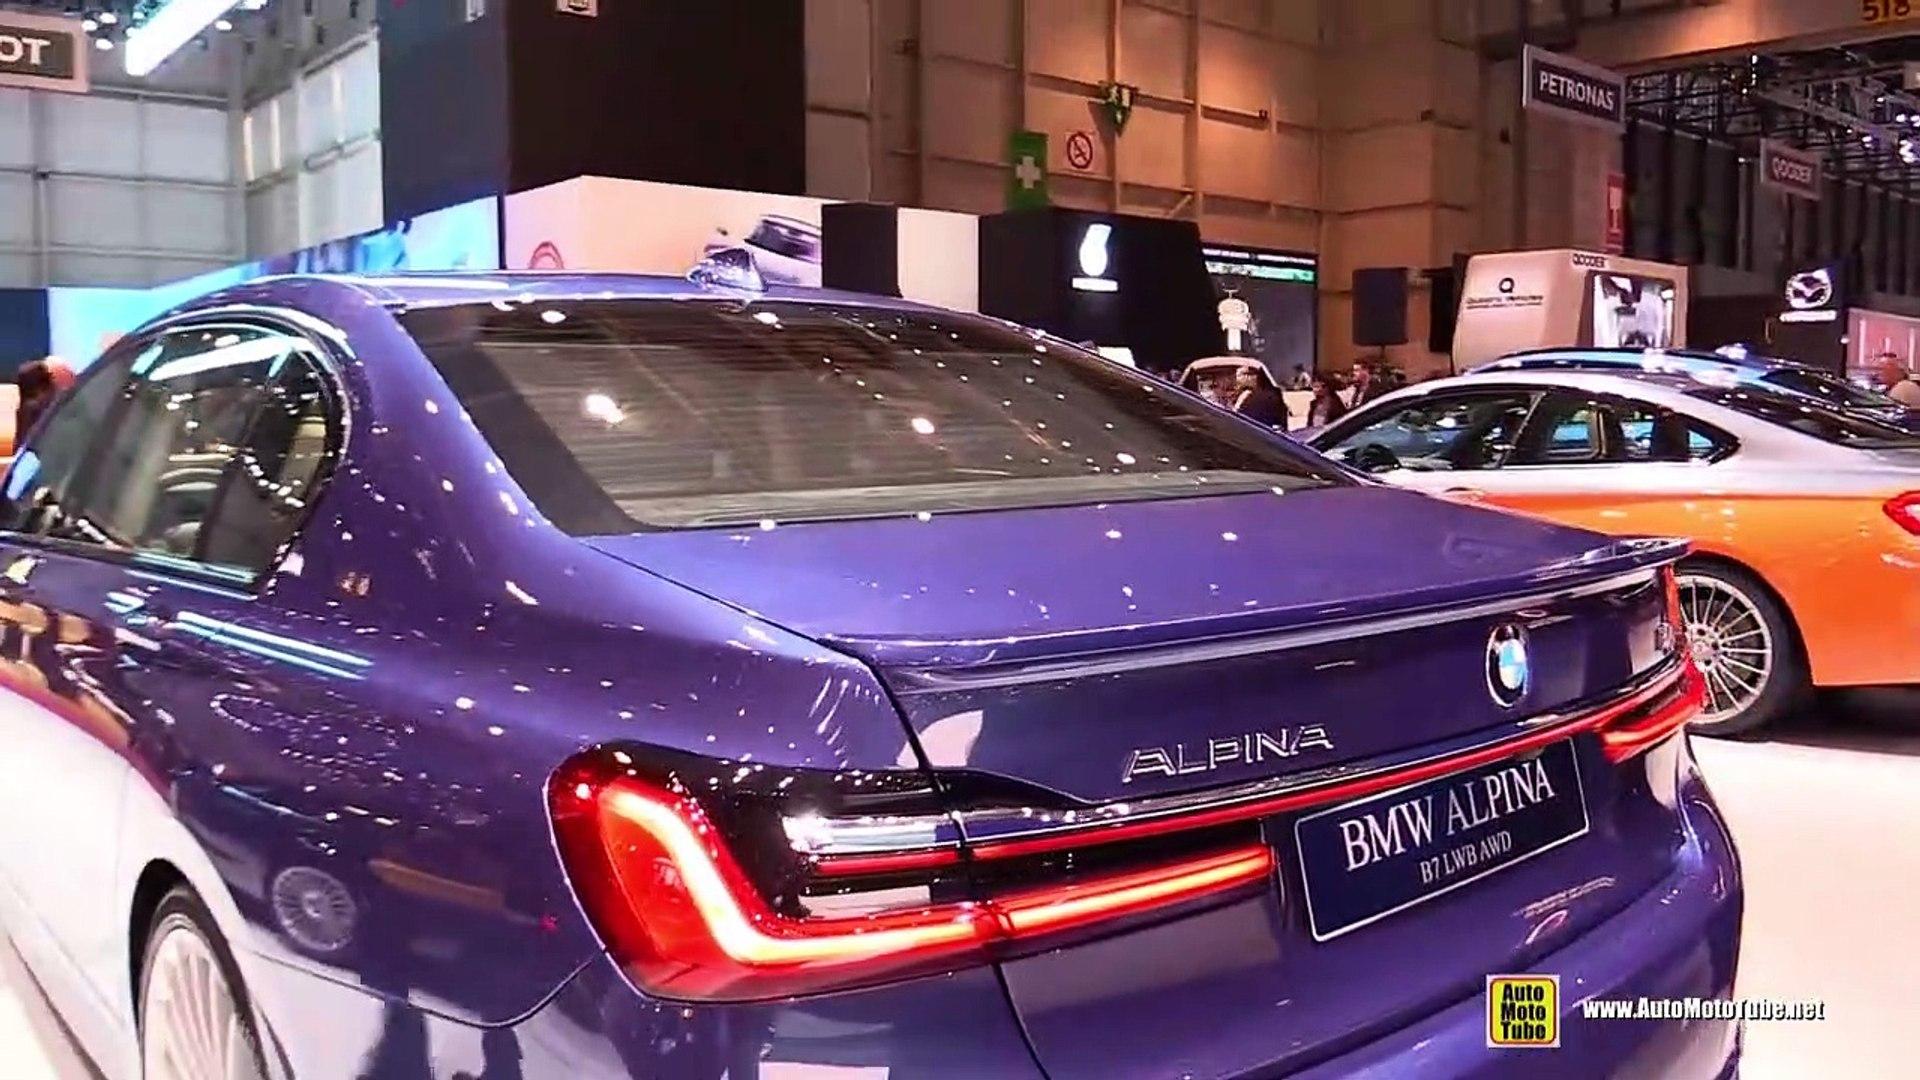 2020 Bmw Alpina B7 Lwb Awd Exterior And Interior Walkaround Debut At 2019 Geneva Motor Show